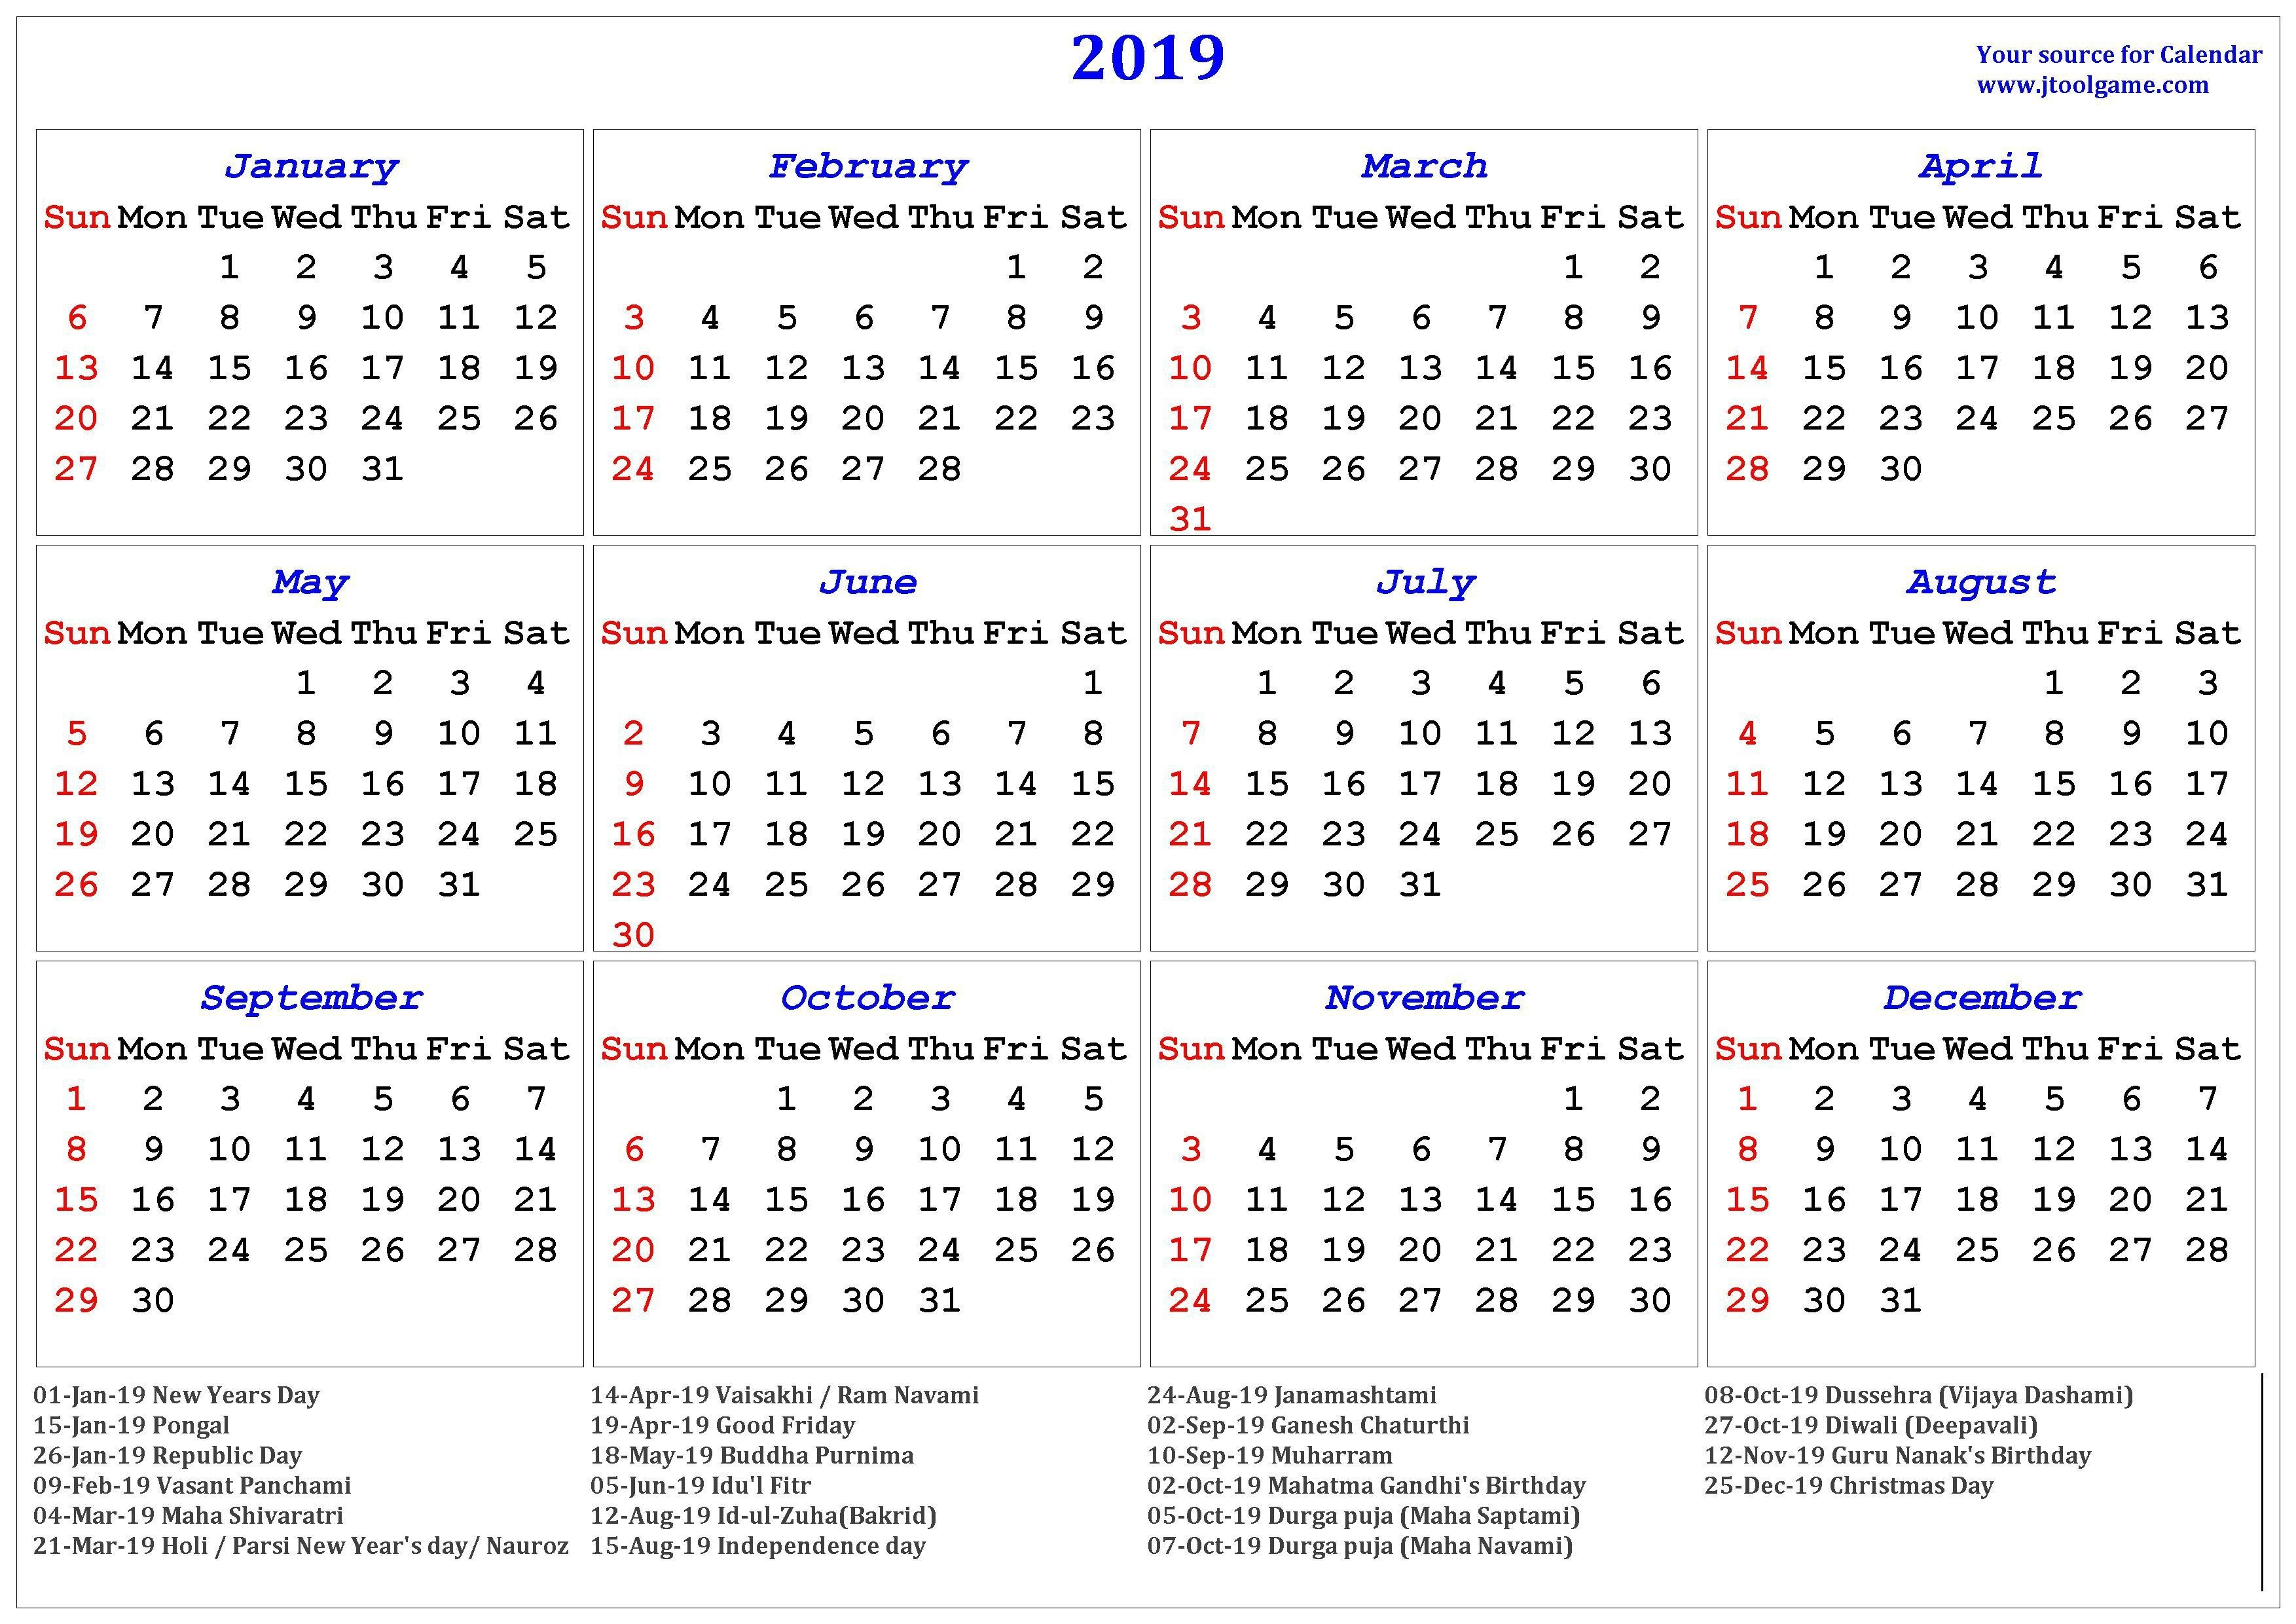 2019 Hindu Calendar With Tithi | Tyohar, Holidays, Festivals-Gujarati Calendar 2020 January